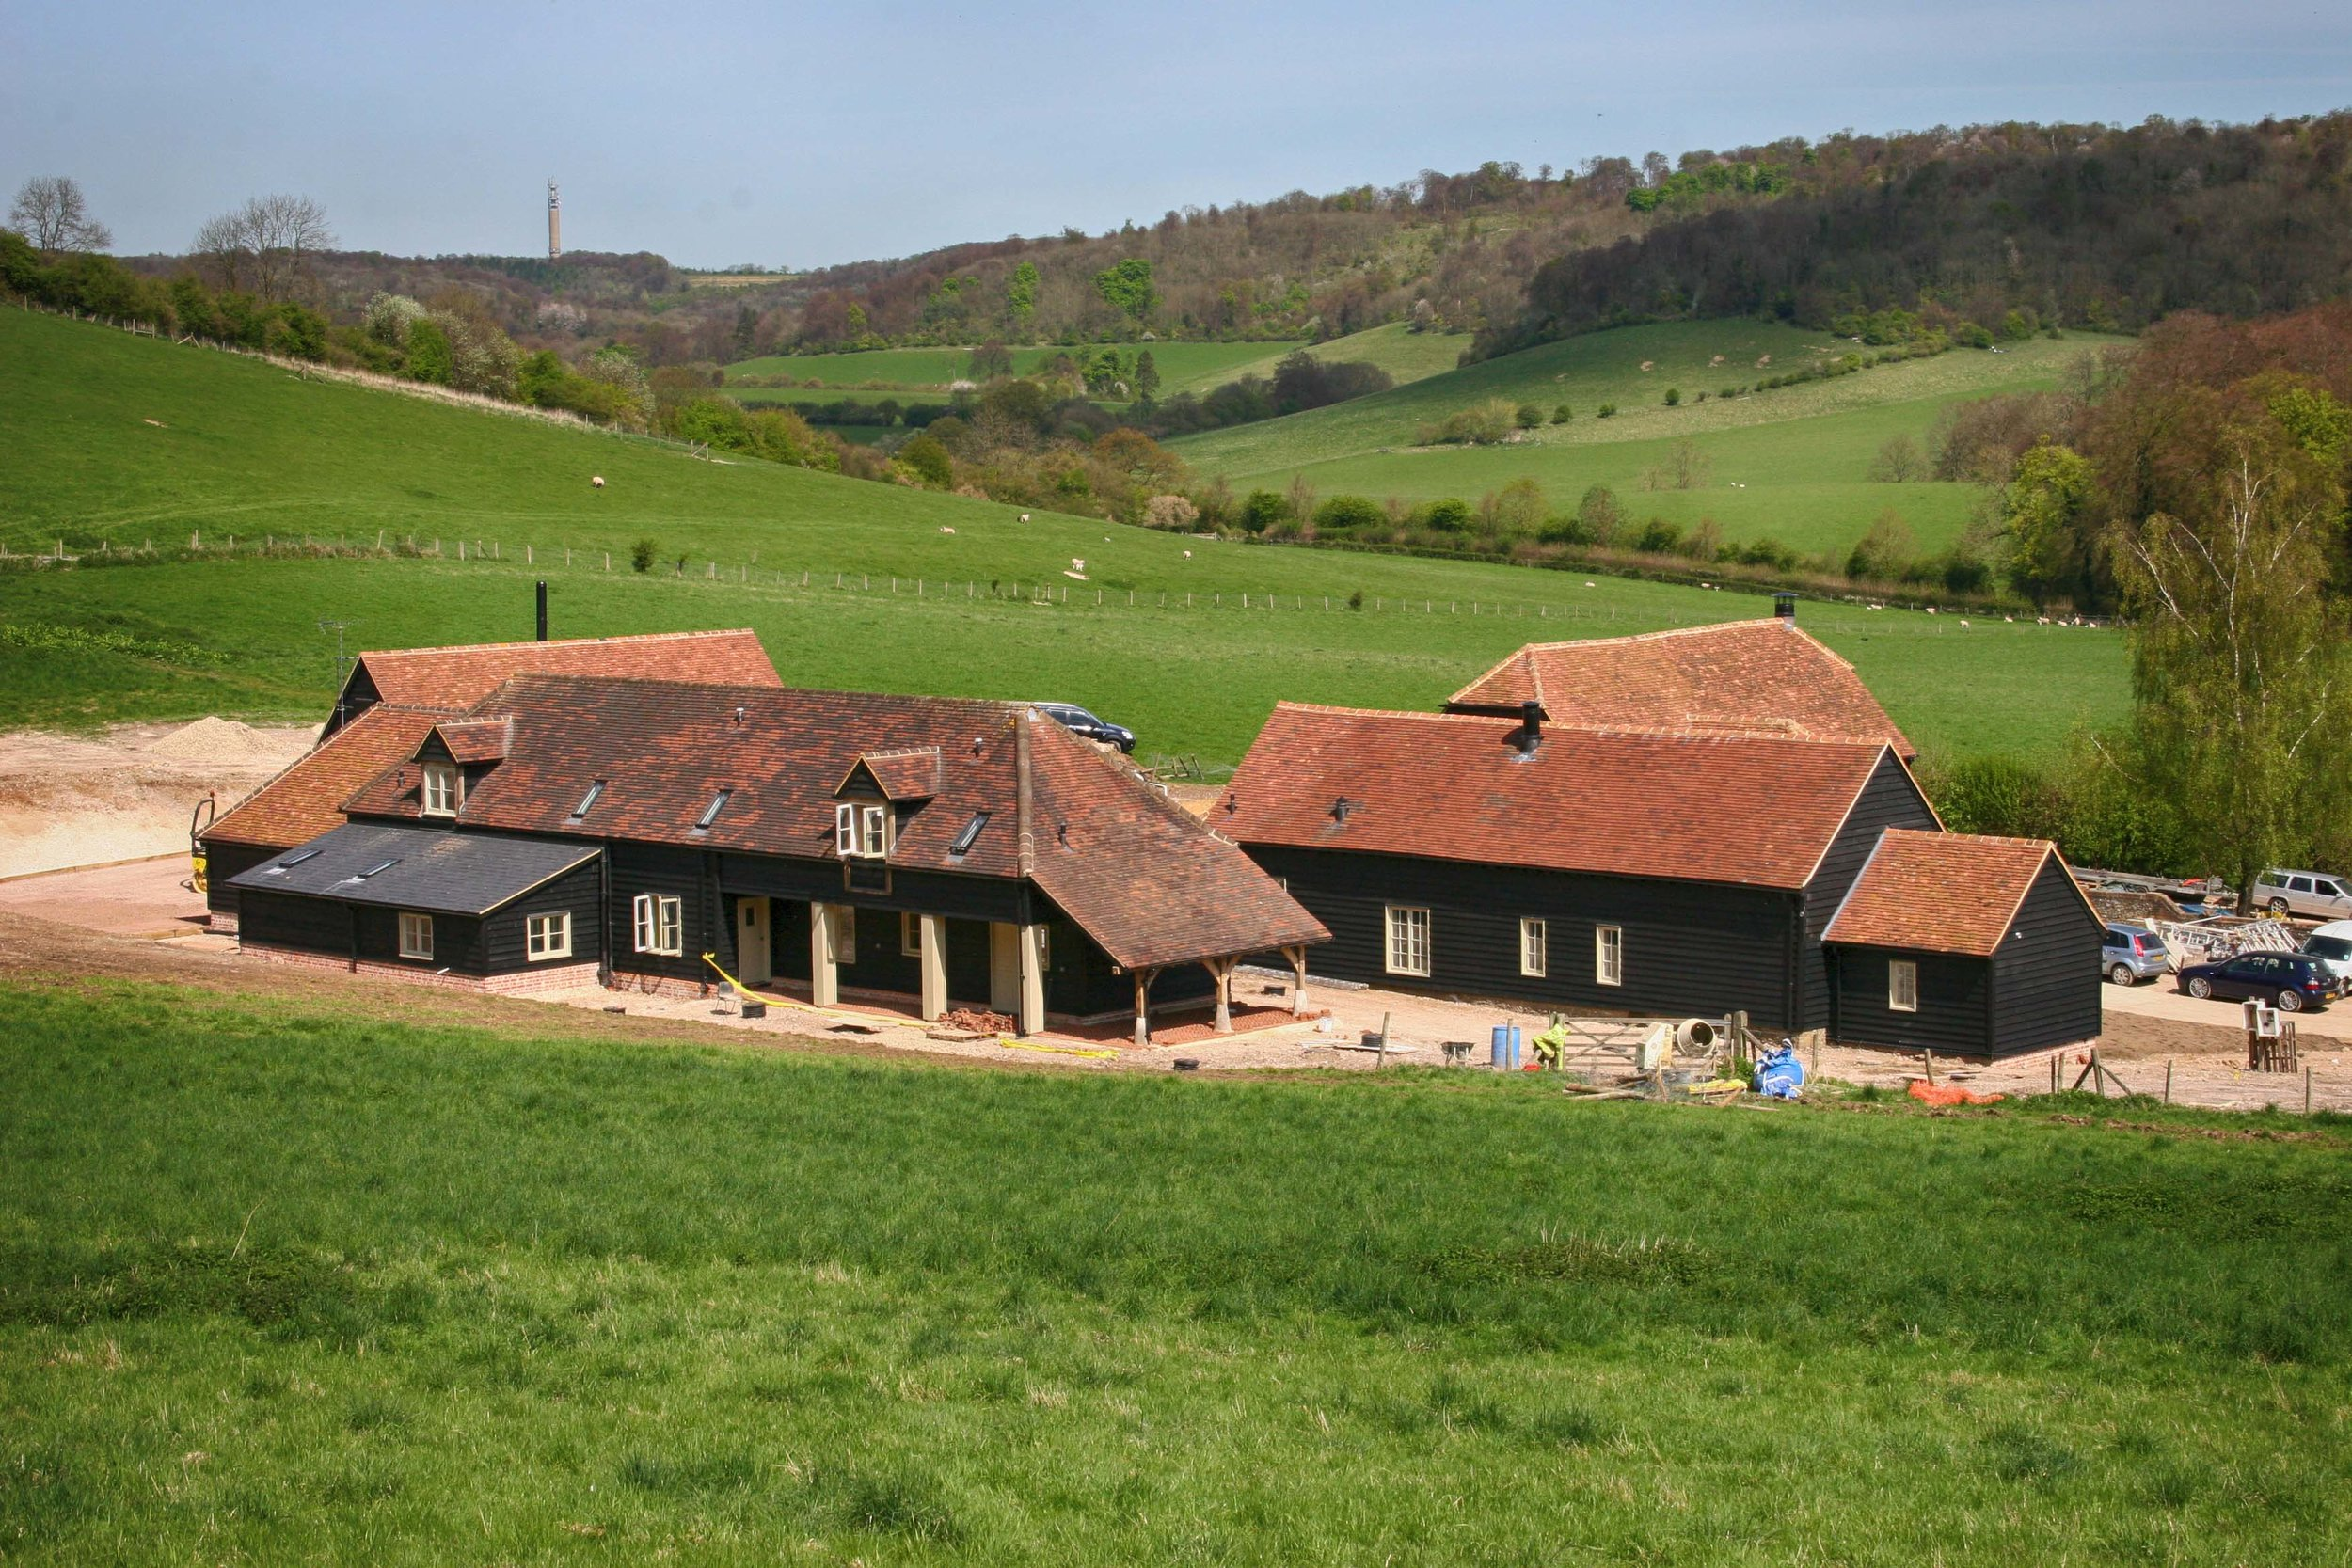 Farm barns under construction